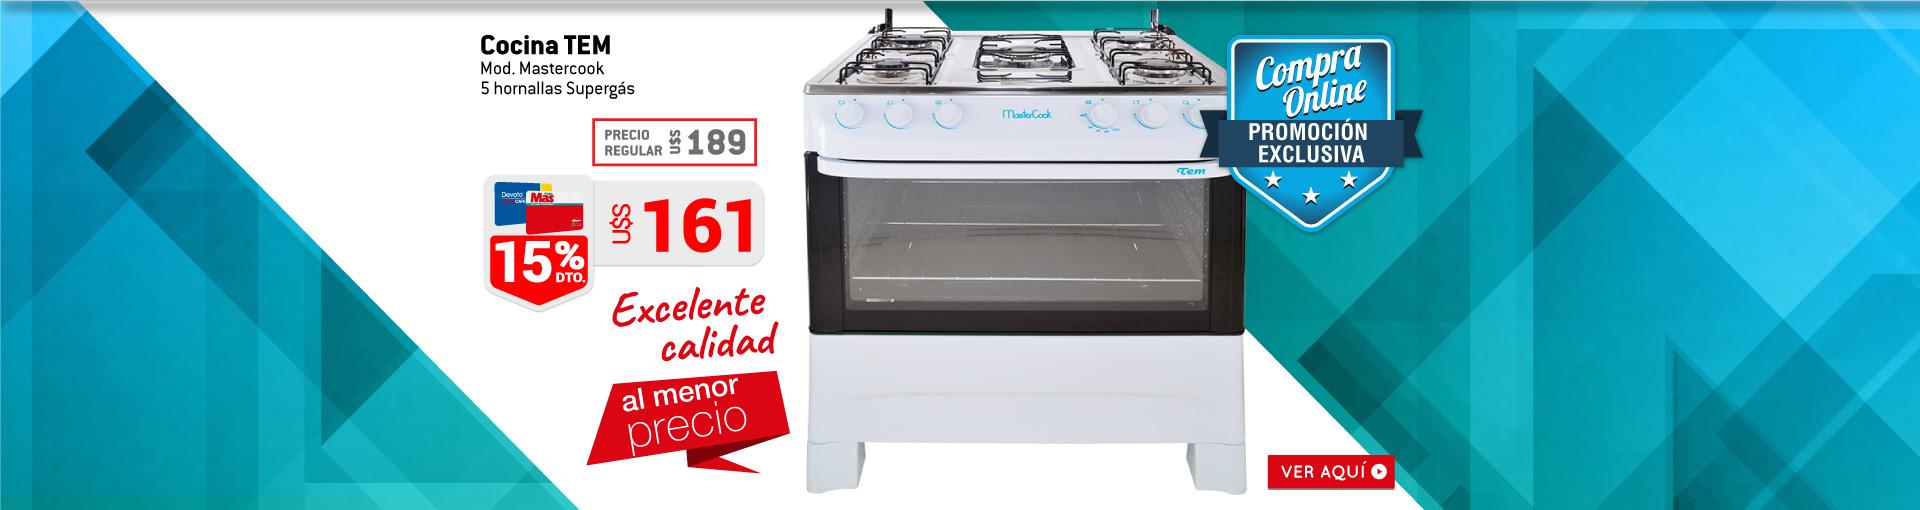 h-01-585050-cocina-tem-mastercook